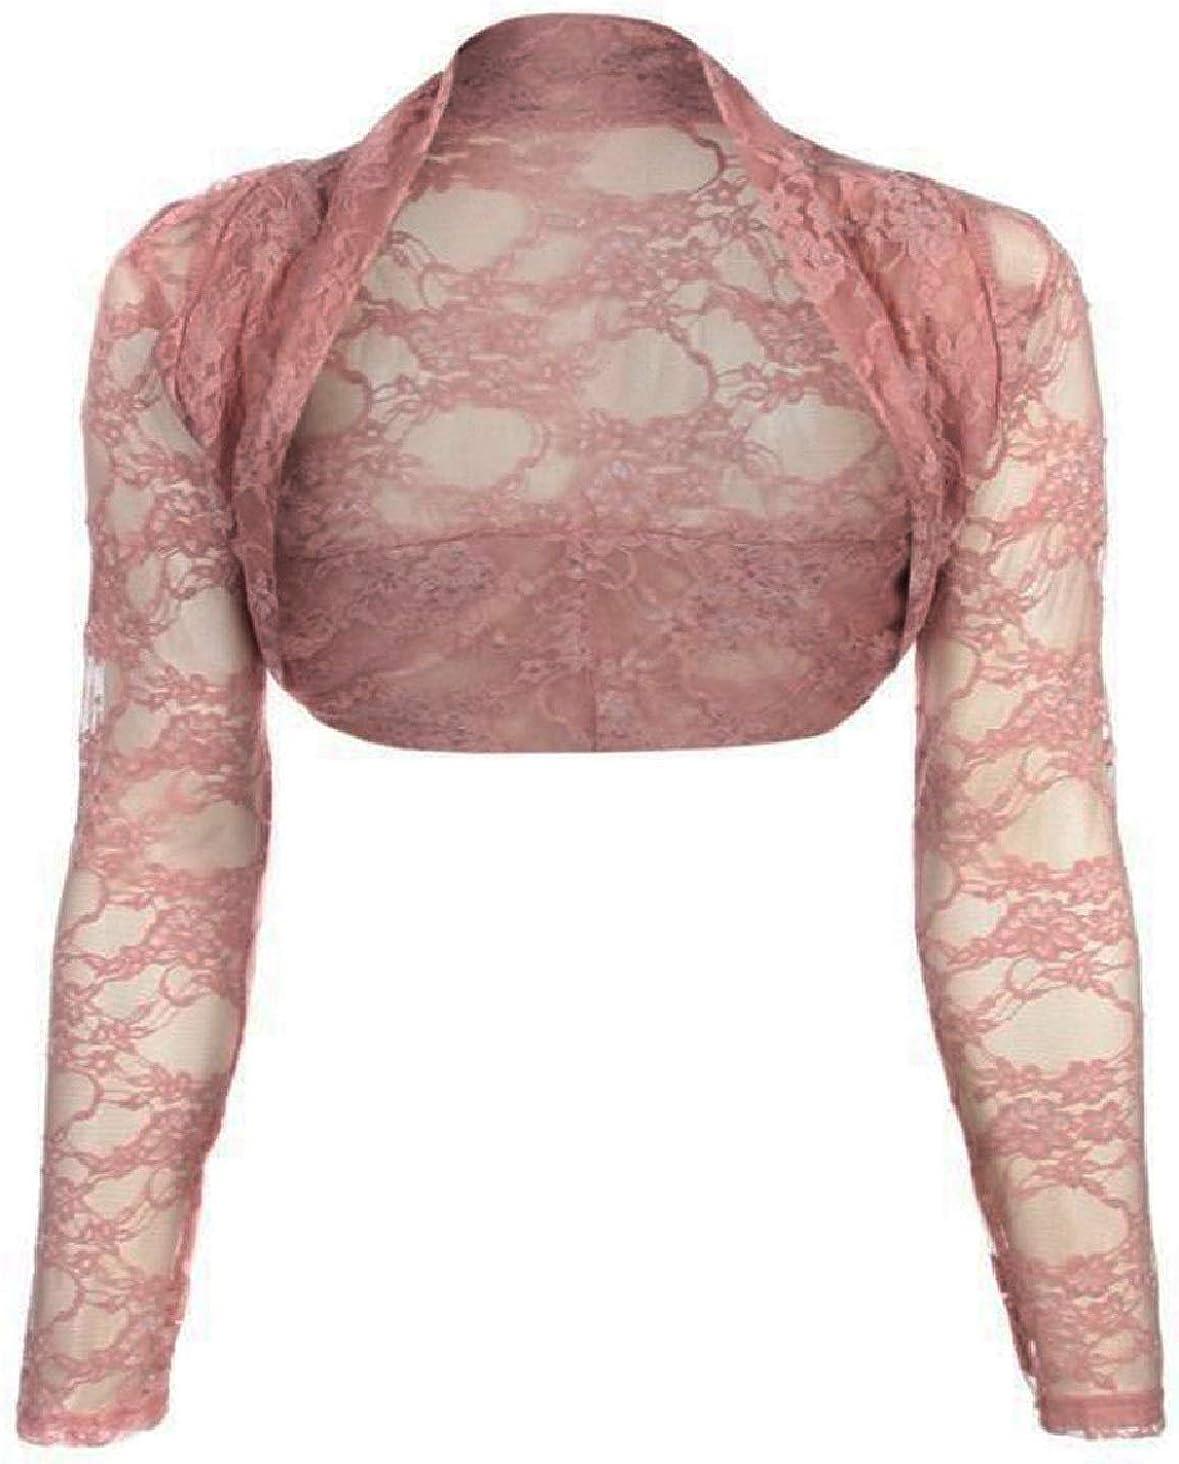 maf Womens Long Sleeve Lace Floral Ladies Cropped Short Shrug Bolero Cardigan Top 6-20 Peach